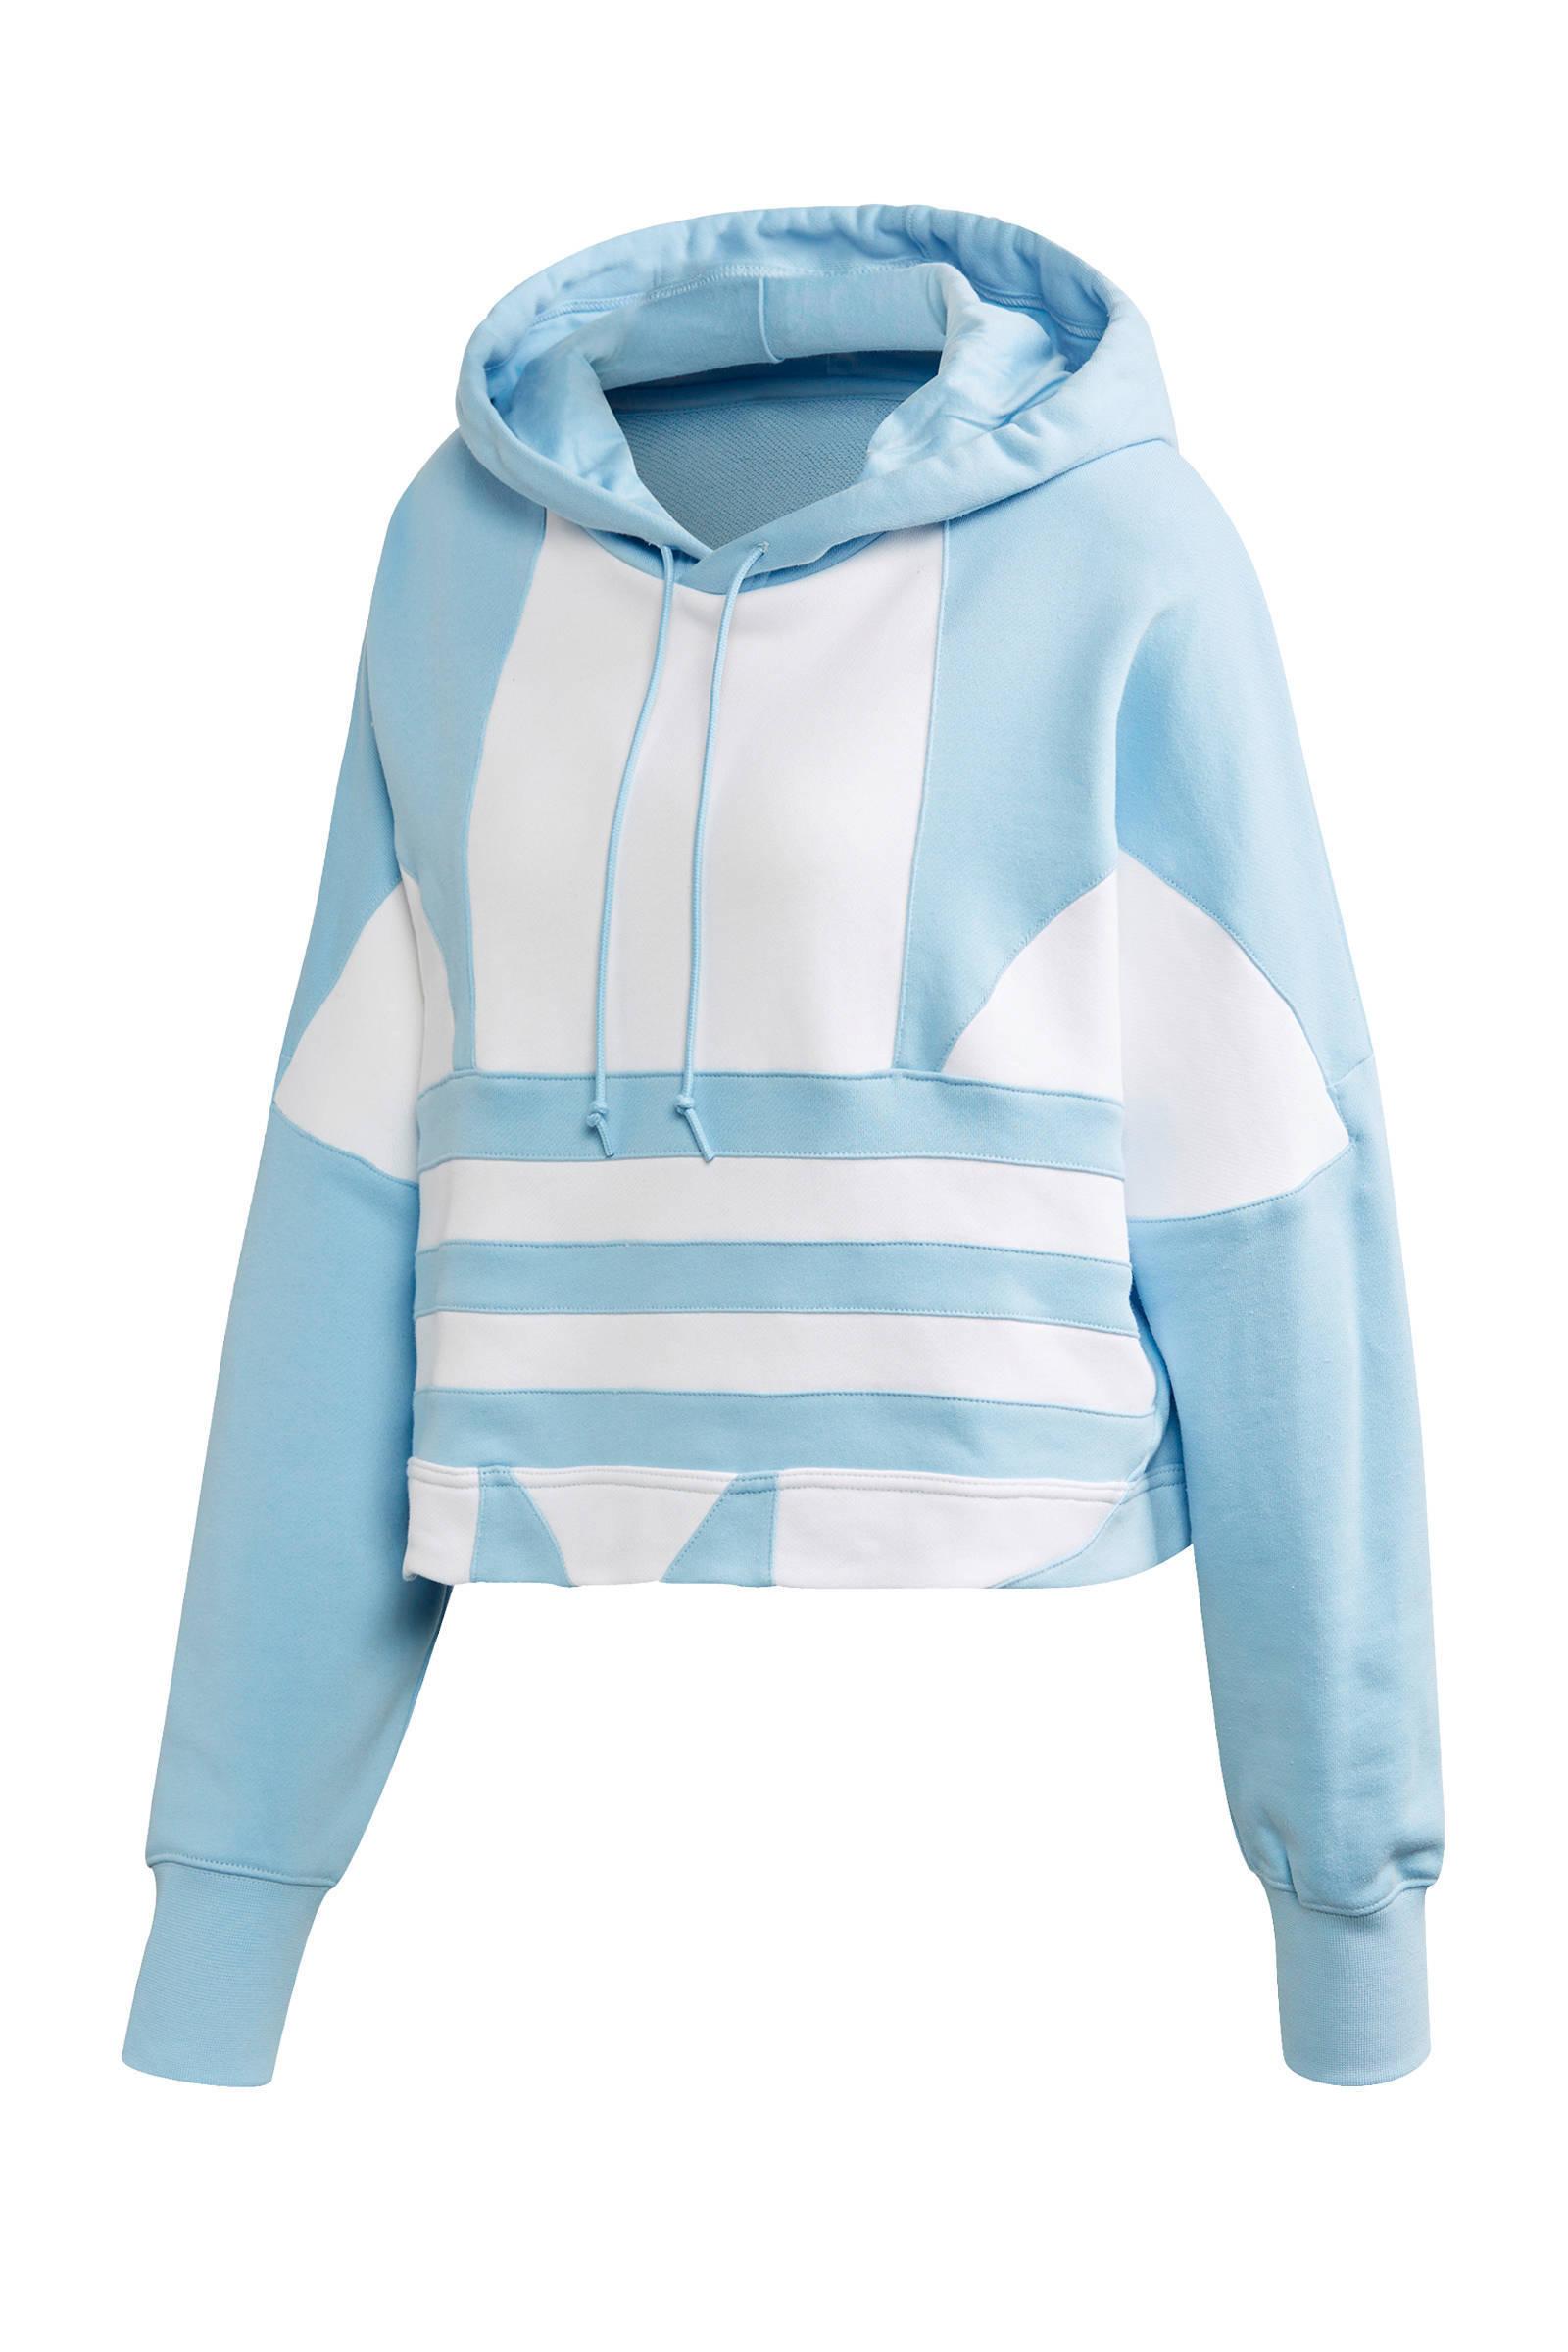 adidas Originals Adicolor cropped hoodie witzwart | wehkamp